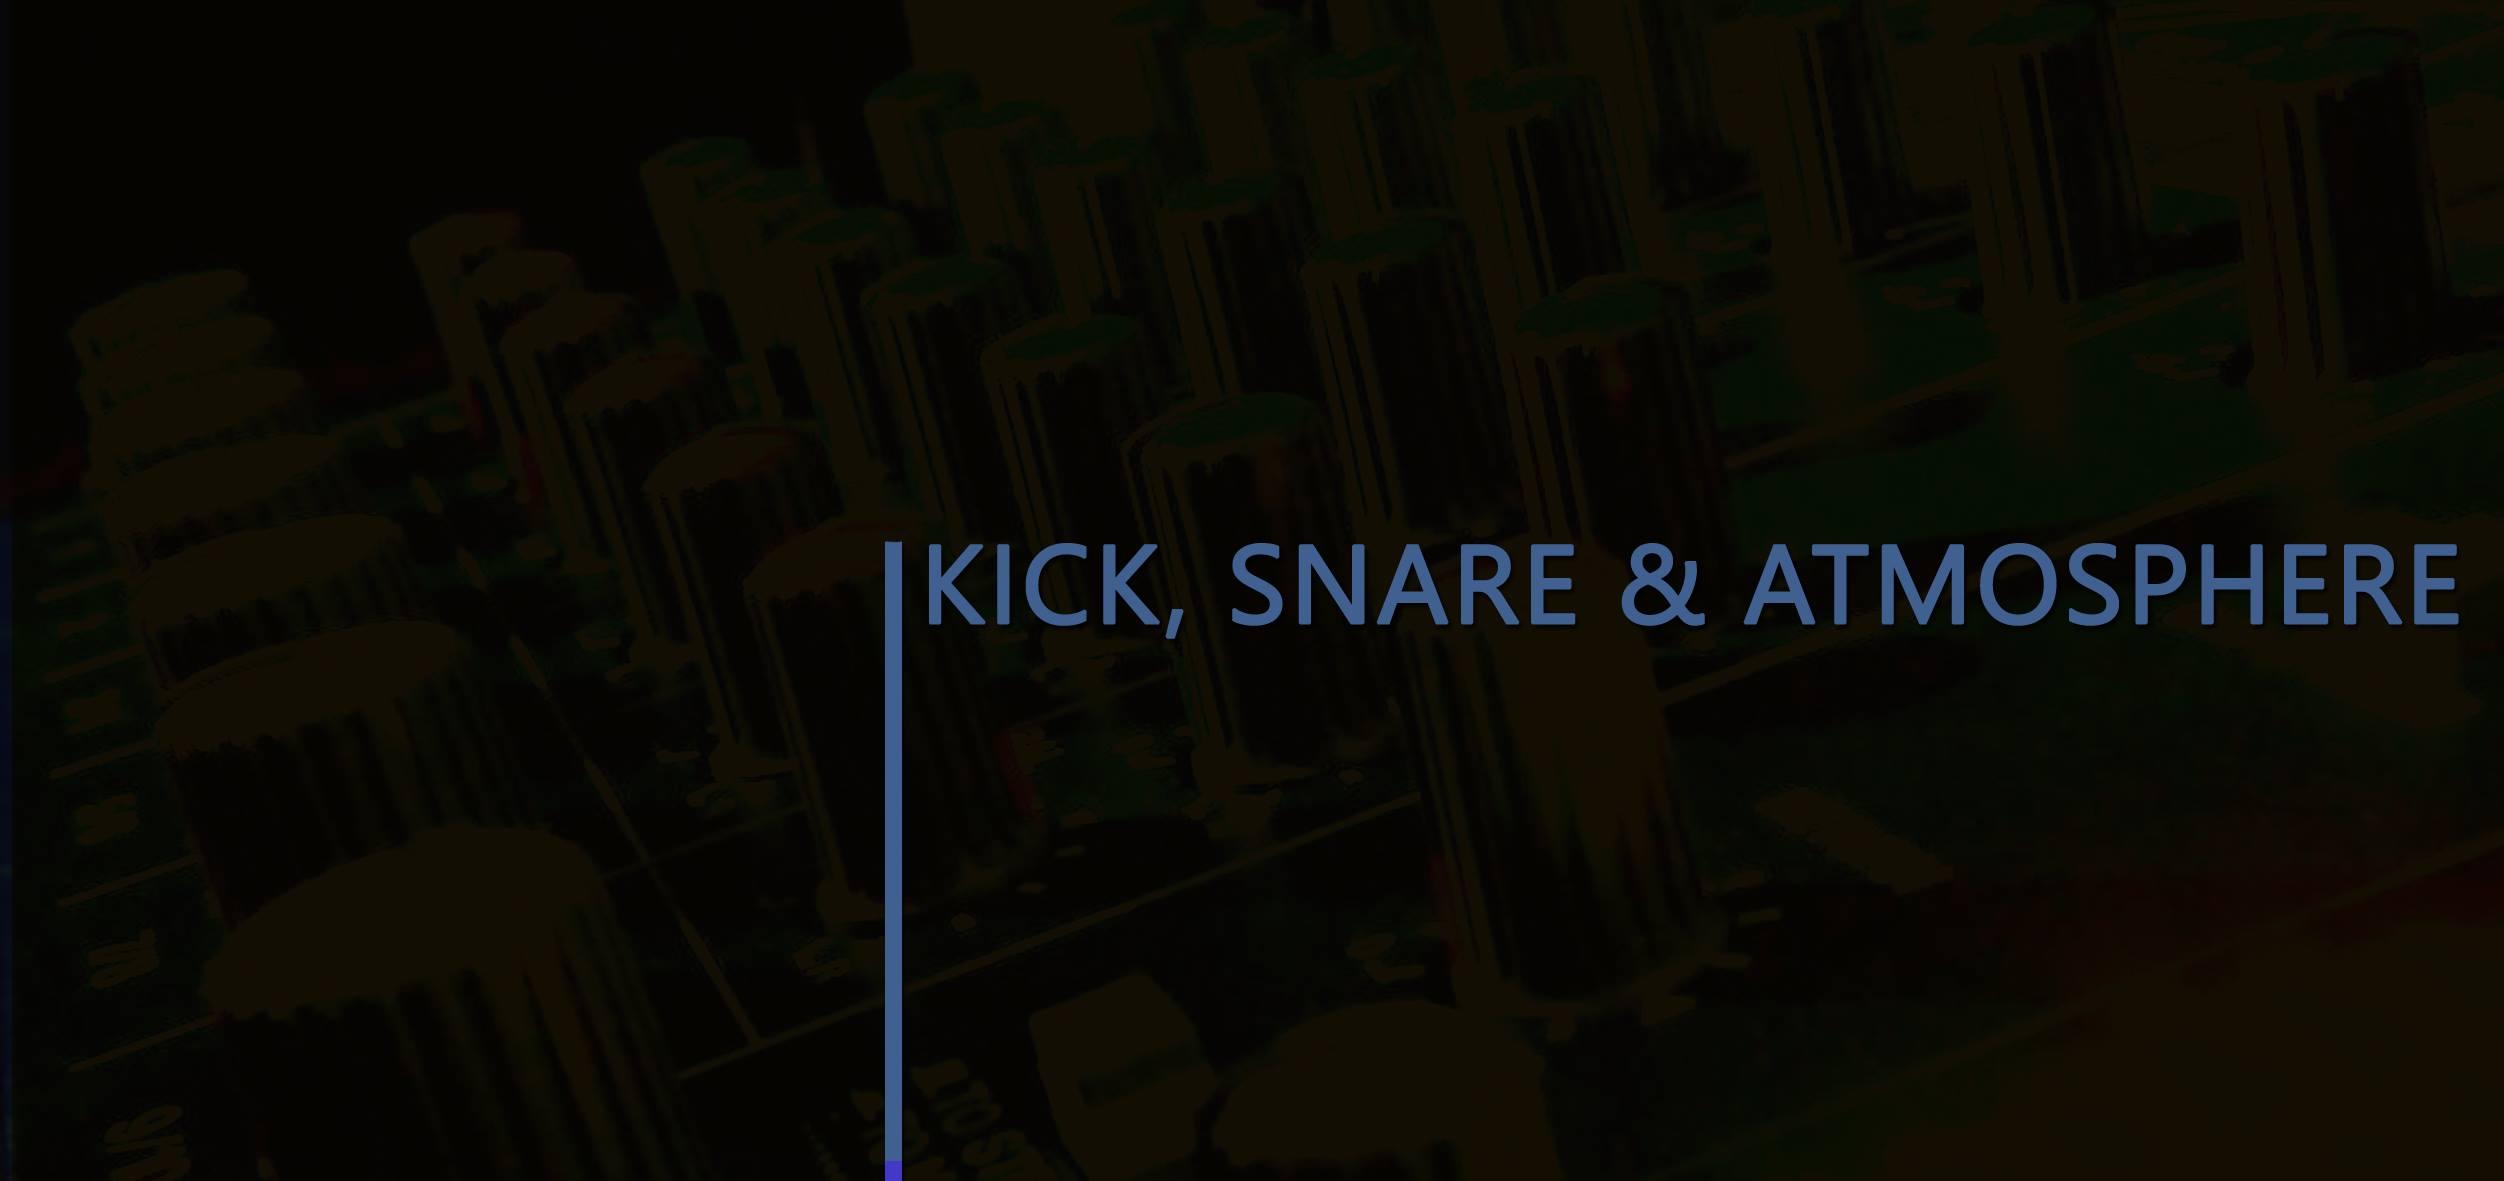 Kick, Snare & Atmosphere